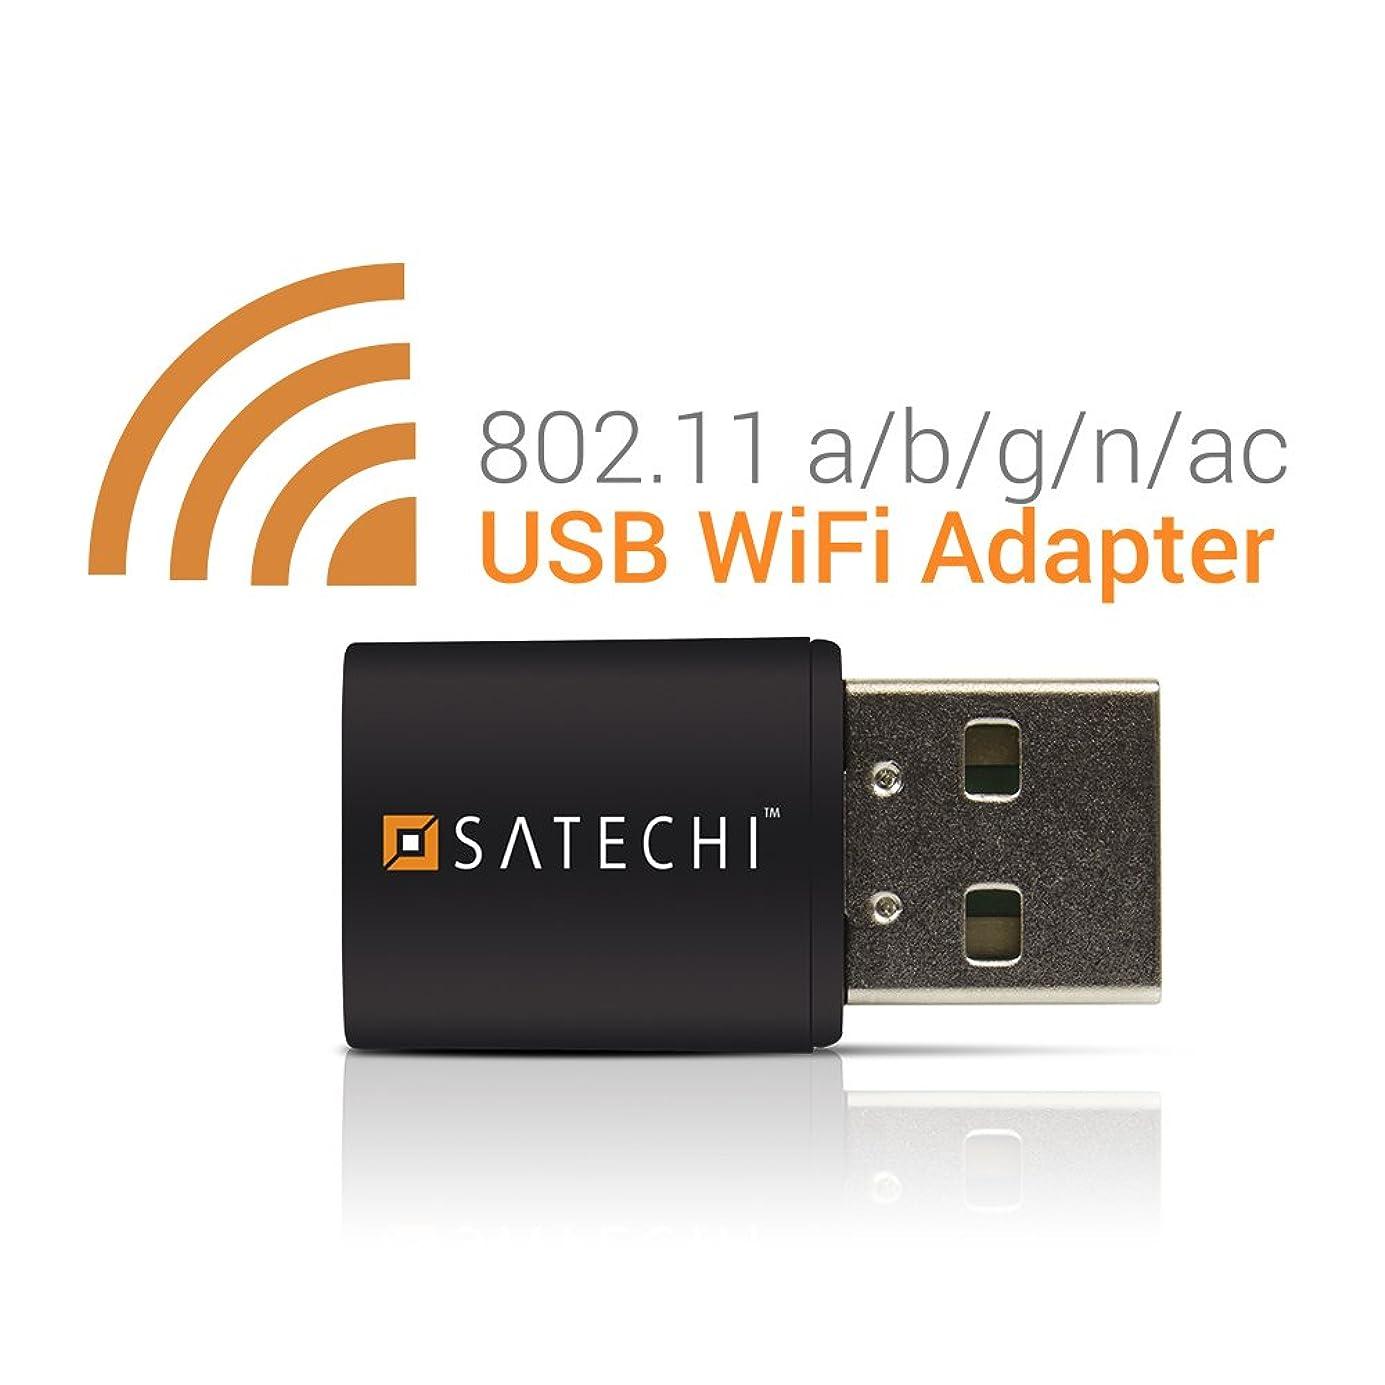 Satechi ワイヤレス USB mini Wi-Fiアダプター 433Mbp 無線LAN子機 デュアルバンド IEEE 802.11 a/b/g/n/ac Windows XP/Vista/7/8/8.1/10対応